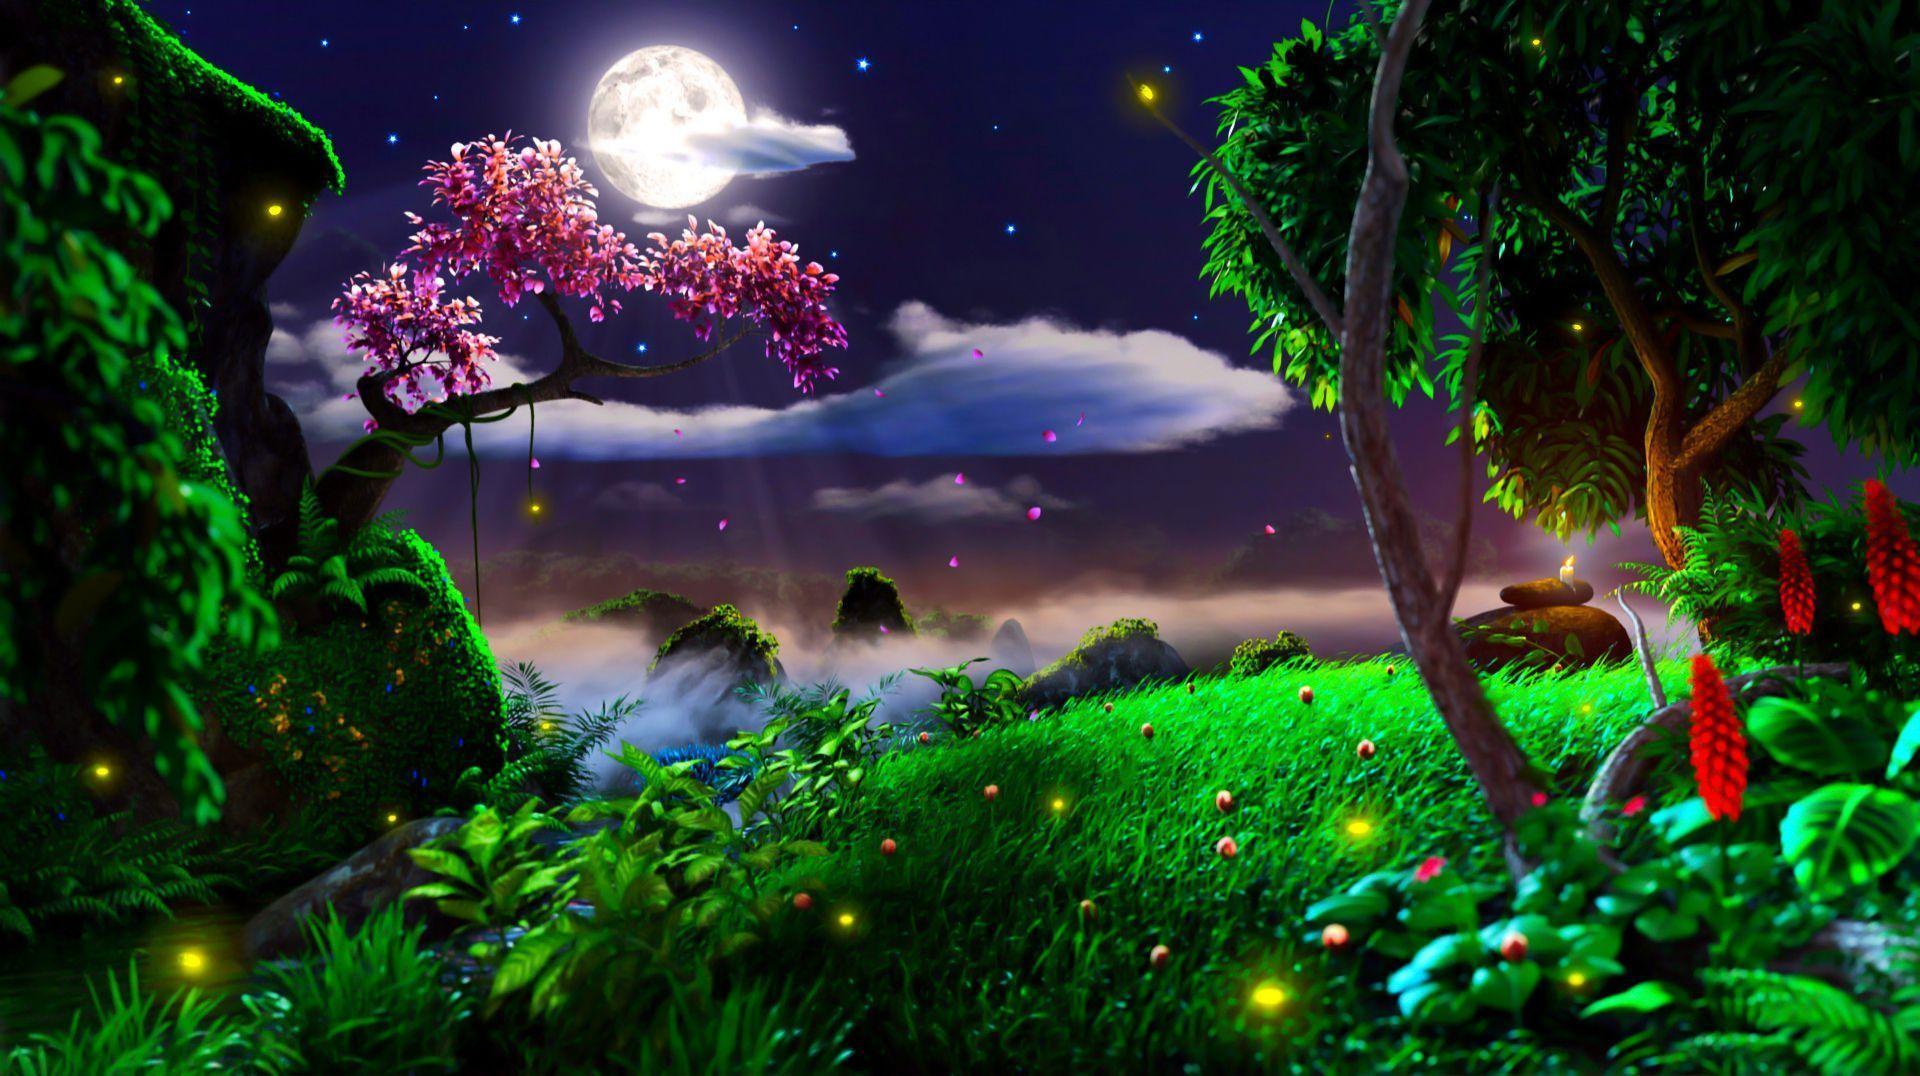 Wallpaper download hd new - Moonlight Desktop Wallpaper Moonlight Images New Wallpapers